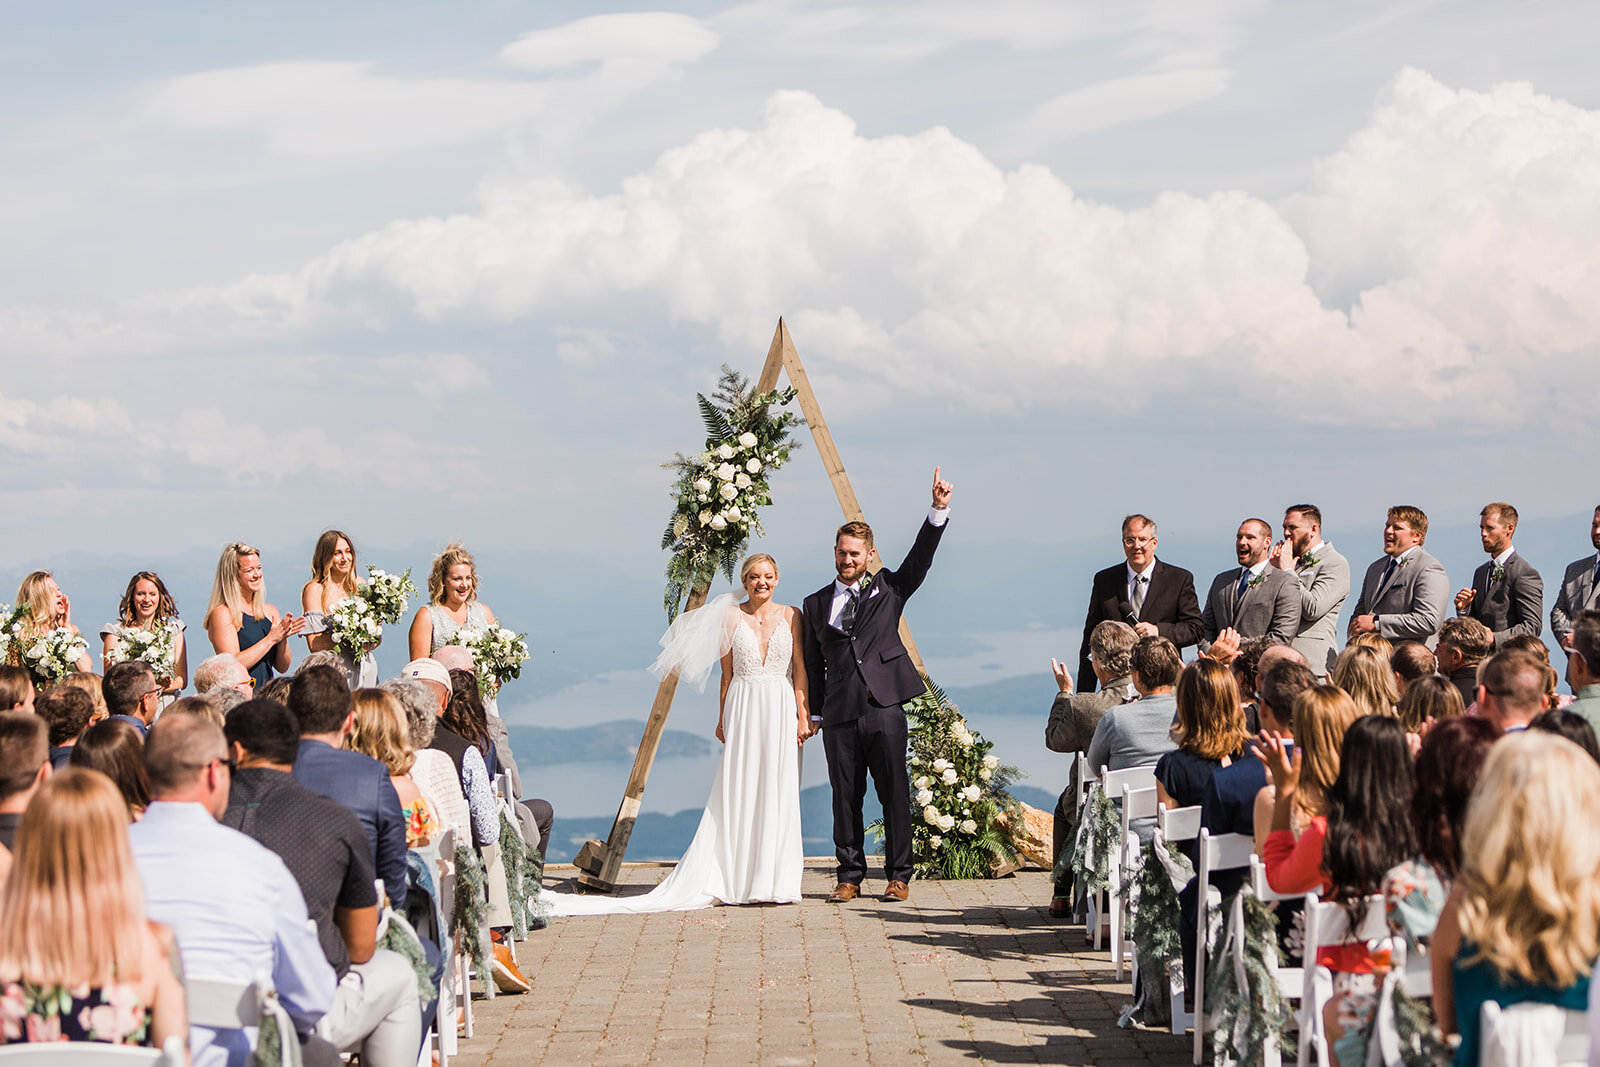 bride and groom spokane wedding first kiss